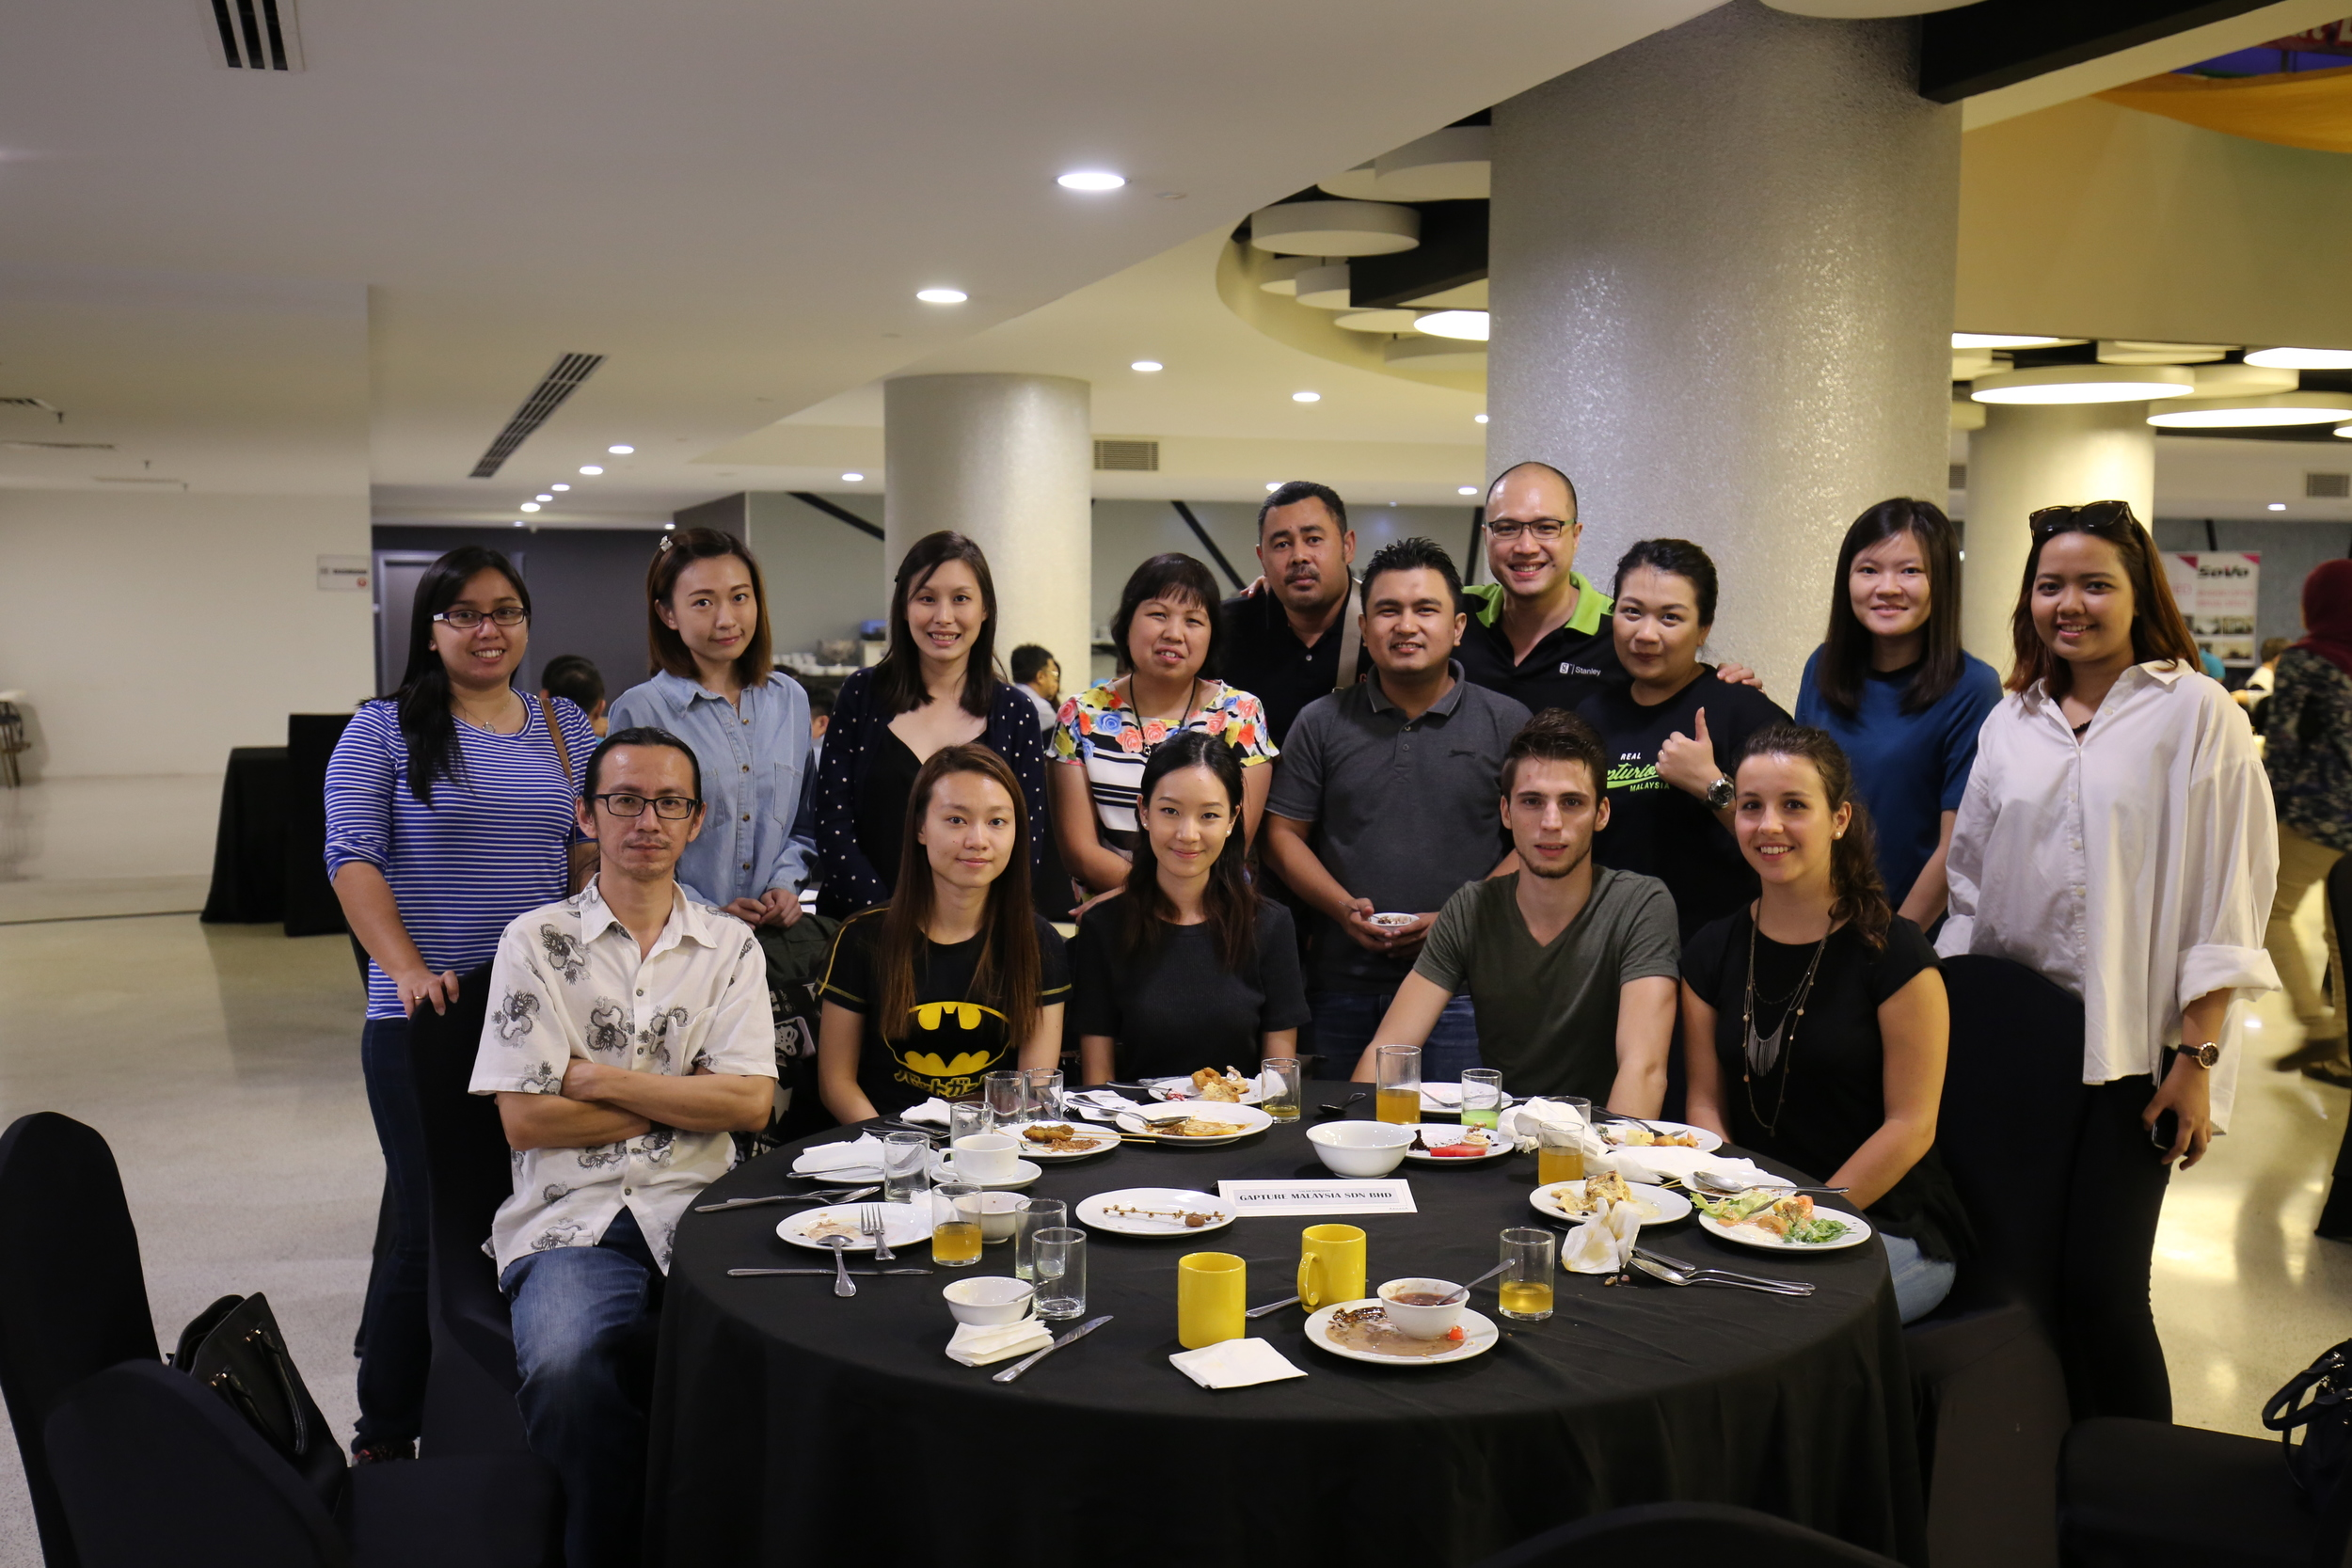 Fellow Gapturions:  Front (from left to right): Fairoz, Sook Yee, Nadine, Alix's boyfriend, Alix  Back (from left to right): Lisa, Josephine, Jilian, Bee Kim, Aji, Amirul, Stanley, Jackie, Lee Yee, Erra